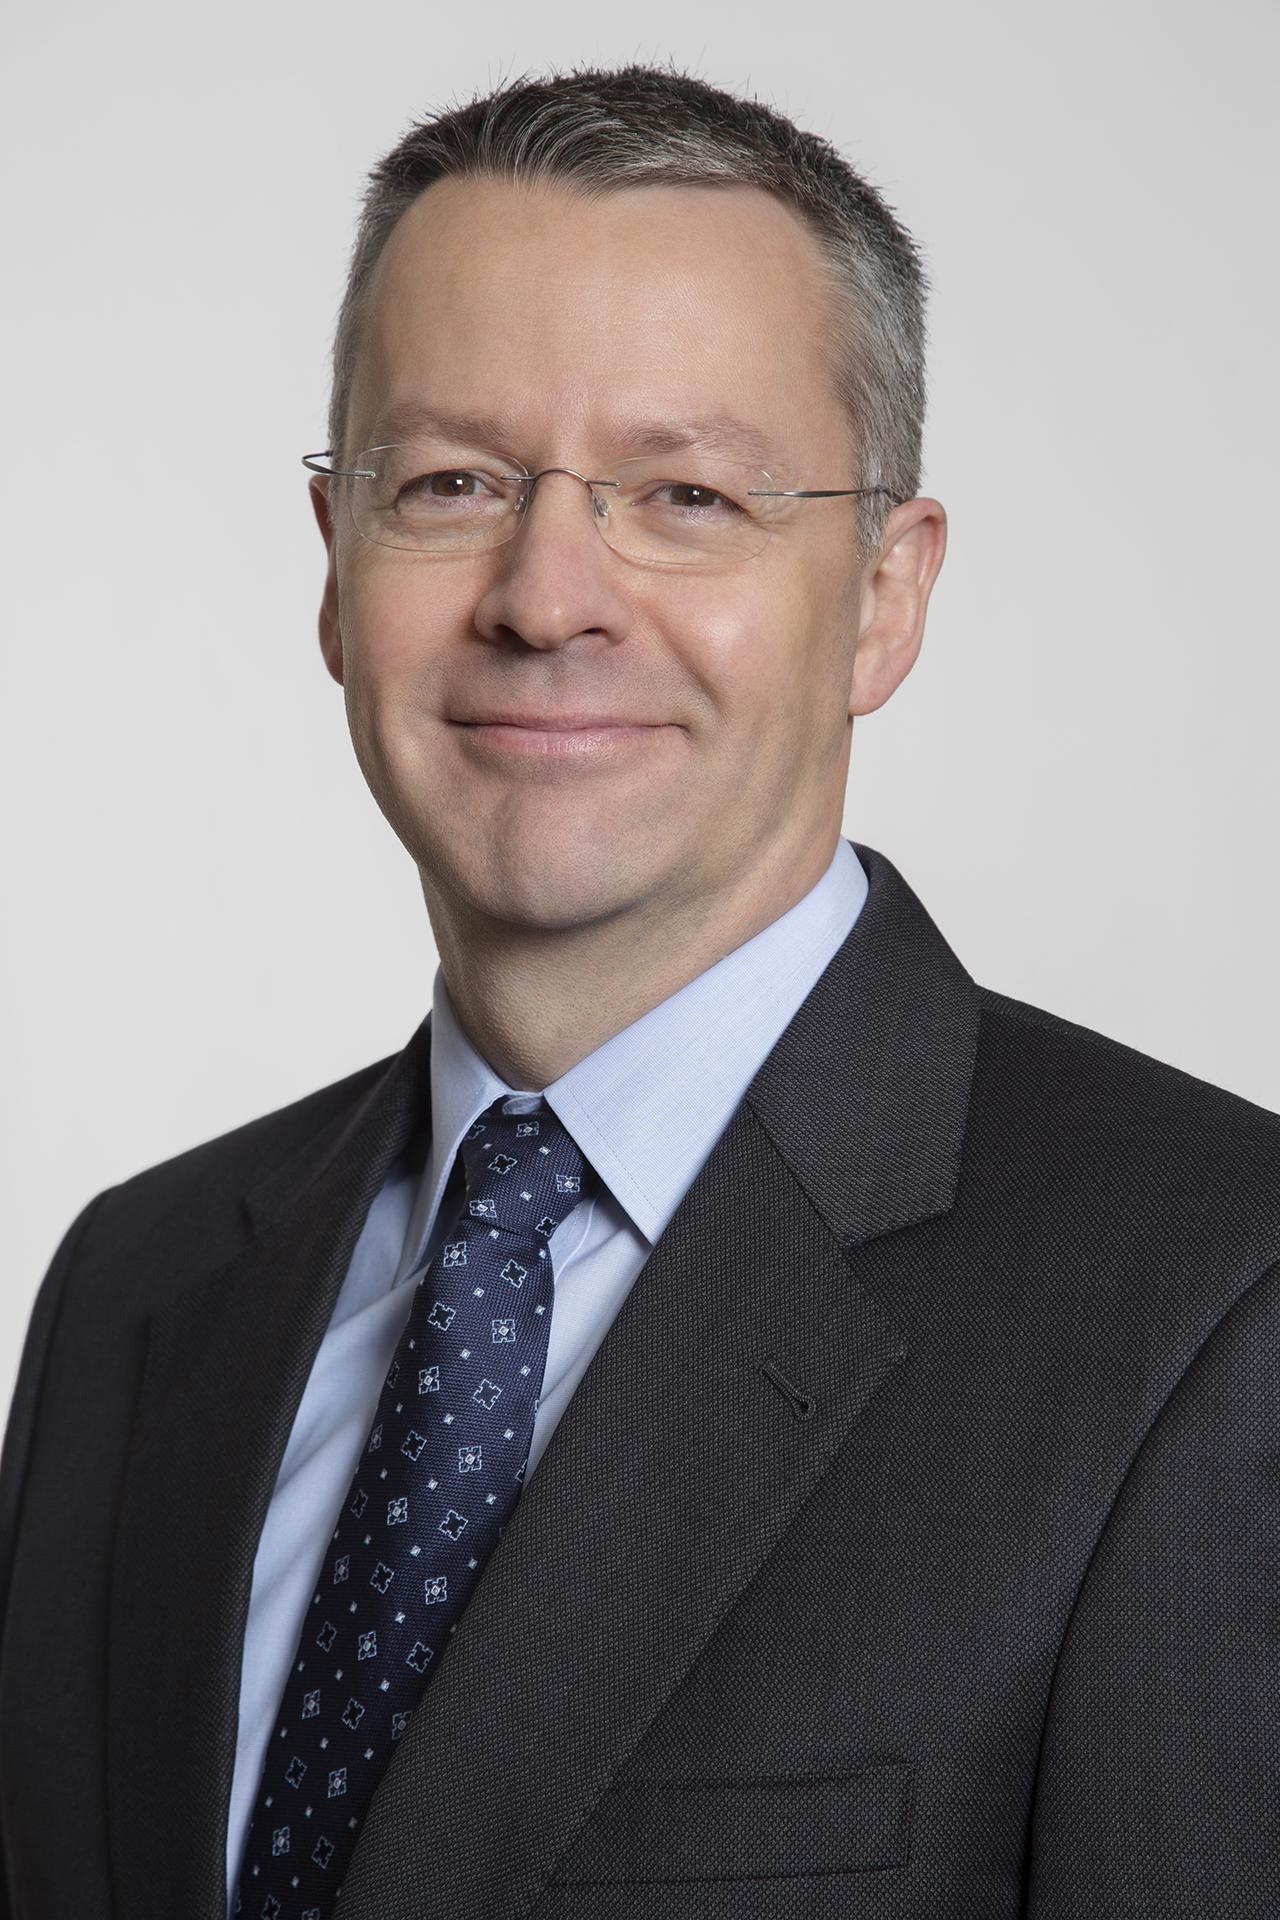 AkzoNobel Thierry Vanlancker